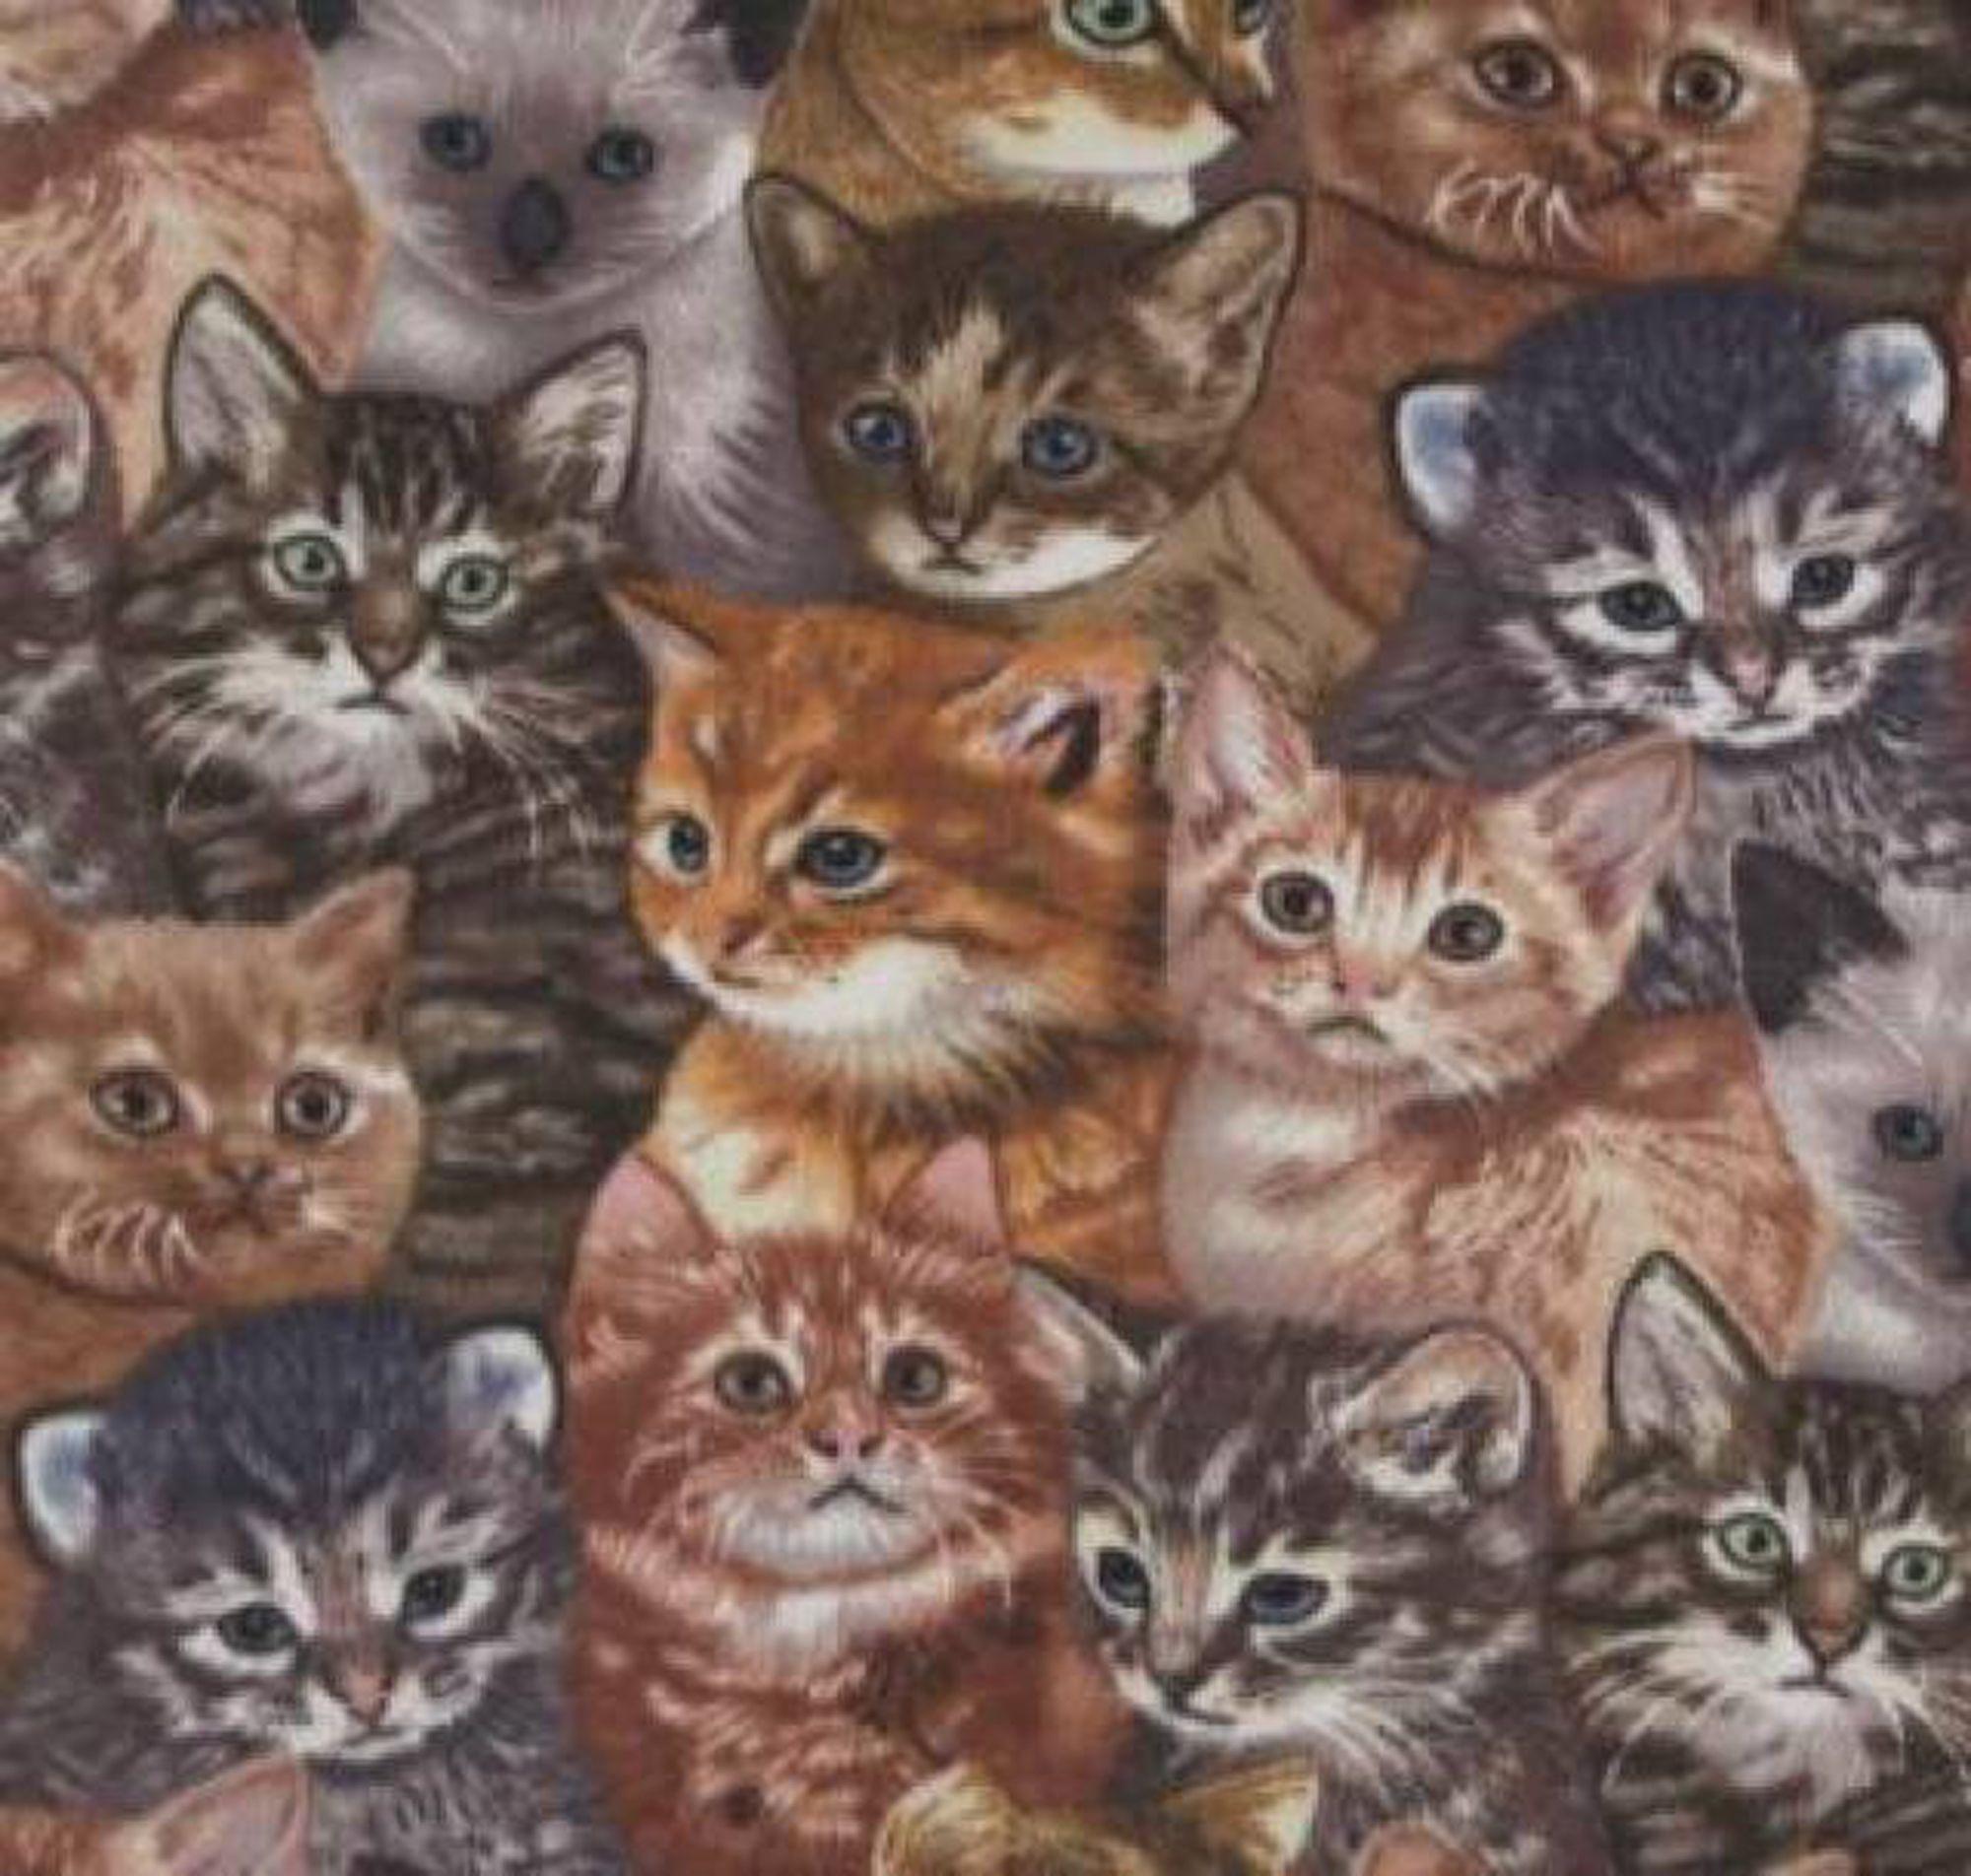 Kittens Fleece Fabric Fleece Fabric Print By The Yard In 2020 Cat Fabric Fleece Throw Blanket Fleece Fabric